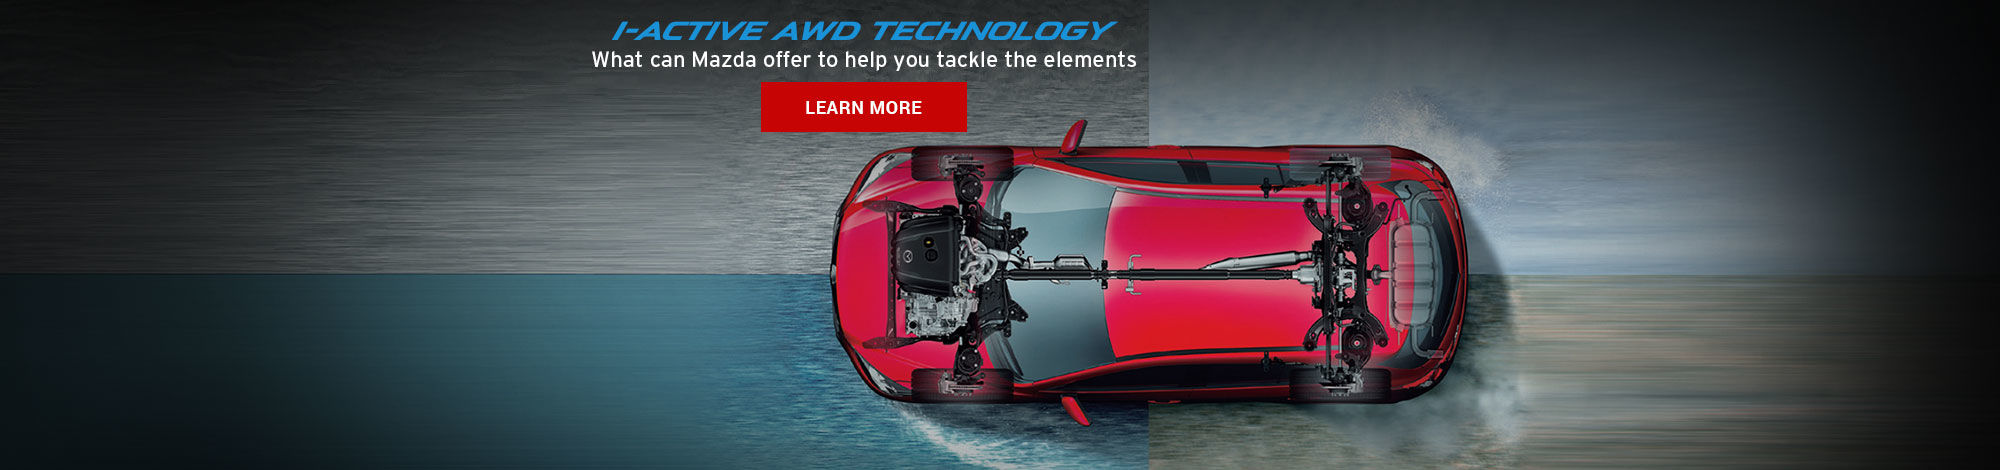 I-Active AWD Technology